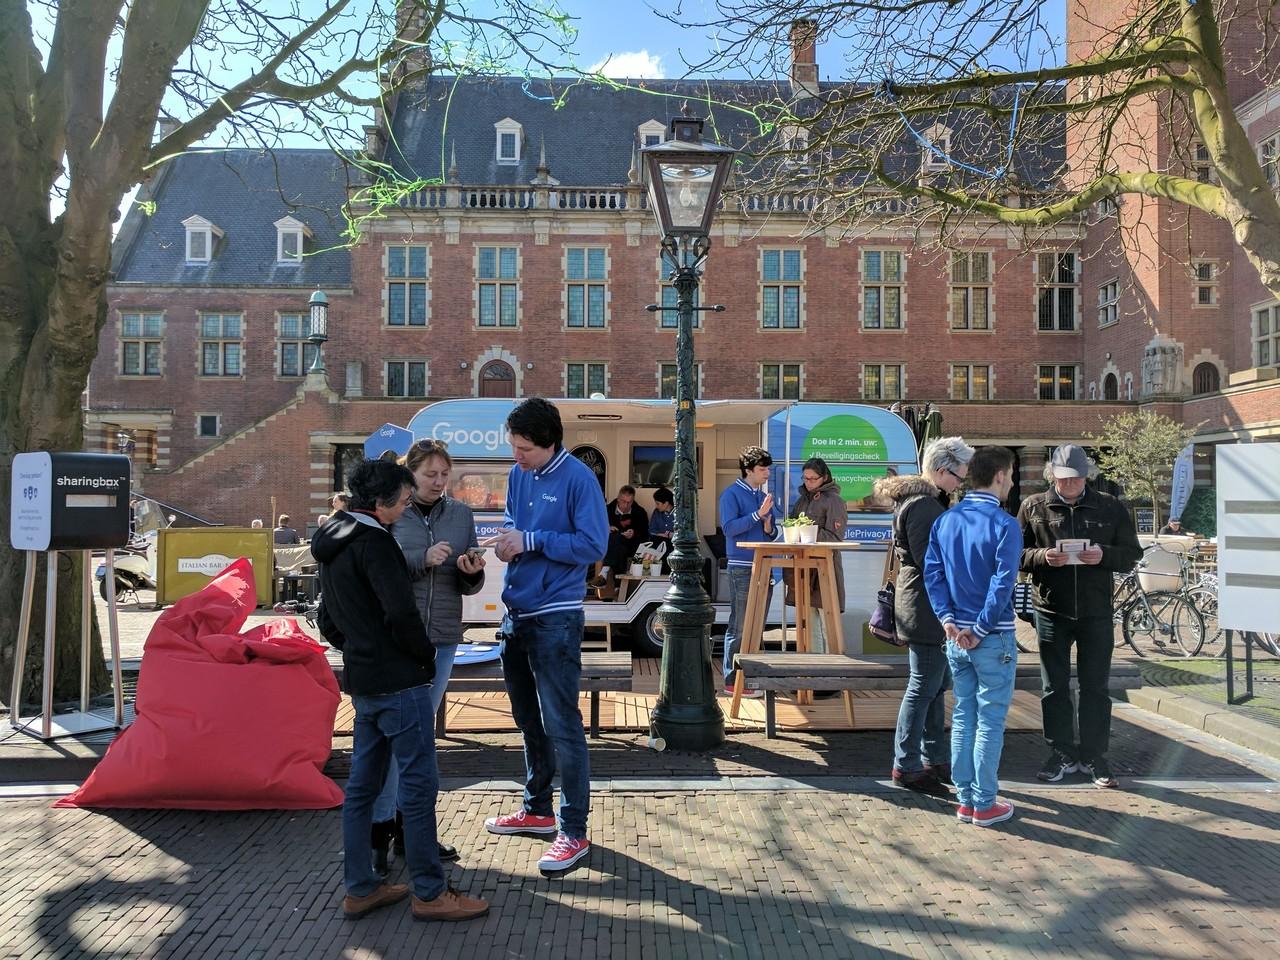 Grootste Nederlandse privacycampagne Google sorteert effect